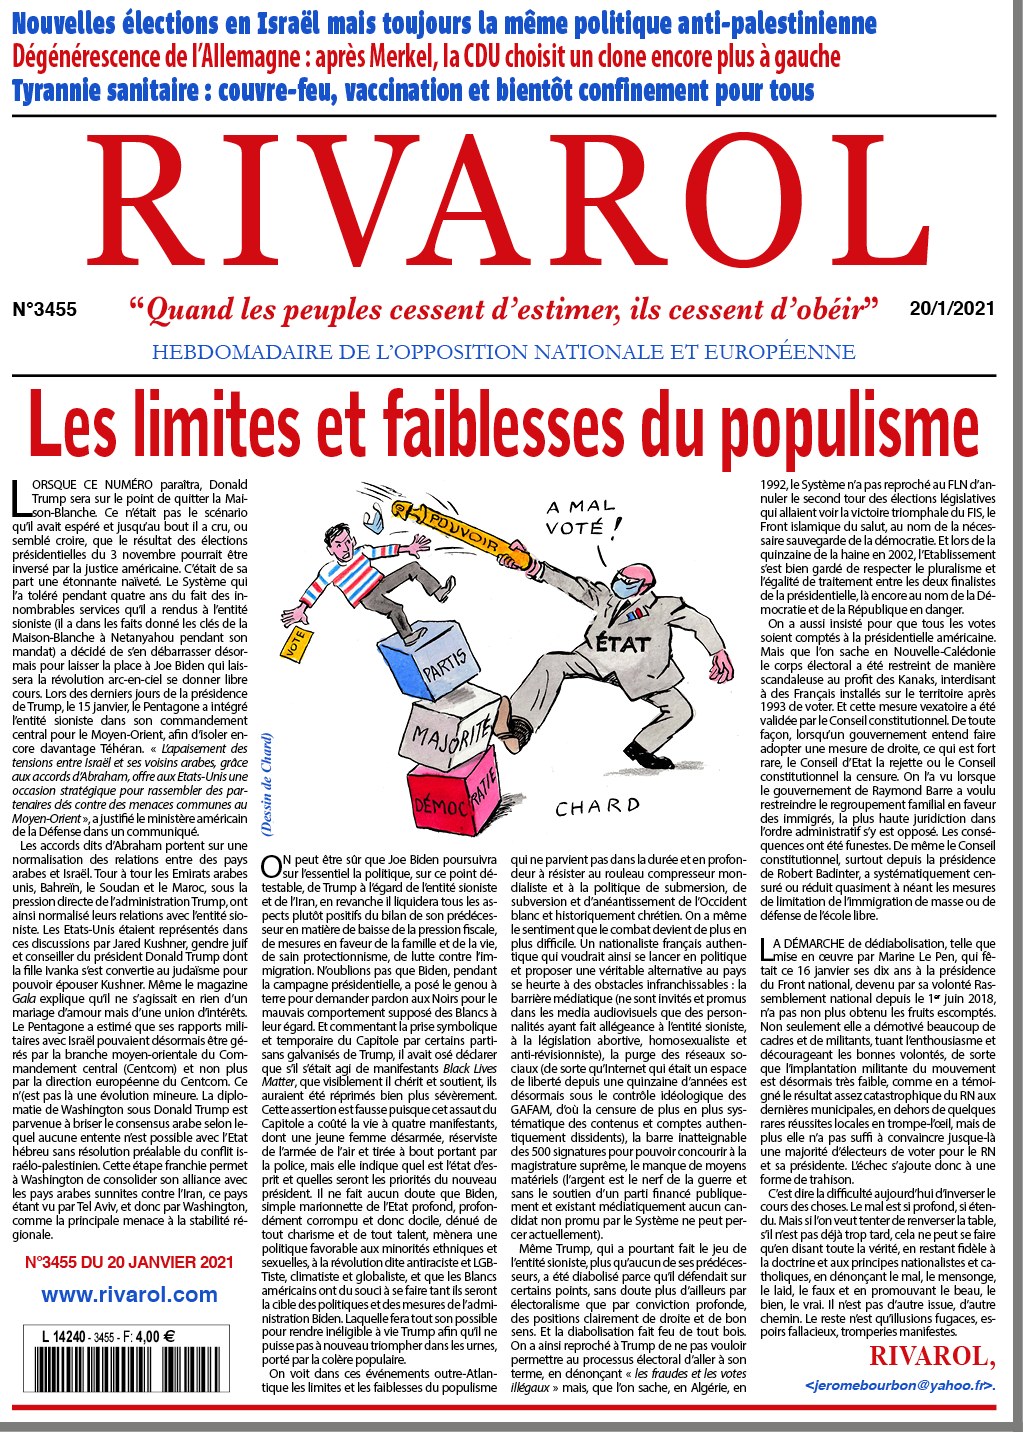 Rivarol n°3455 du 20/1/2021